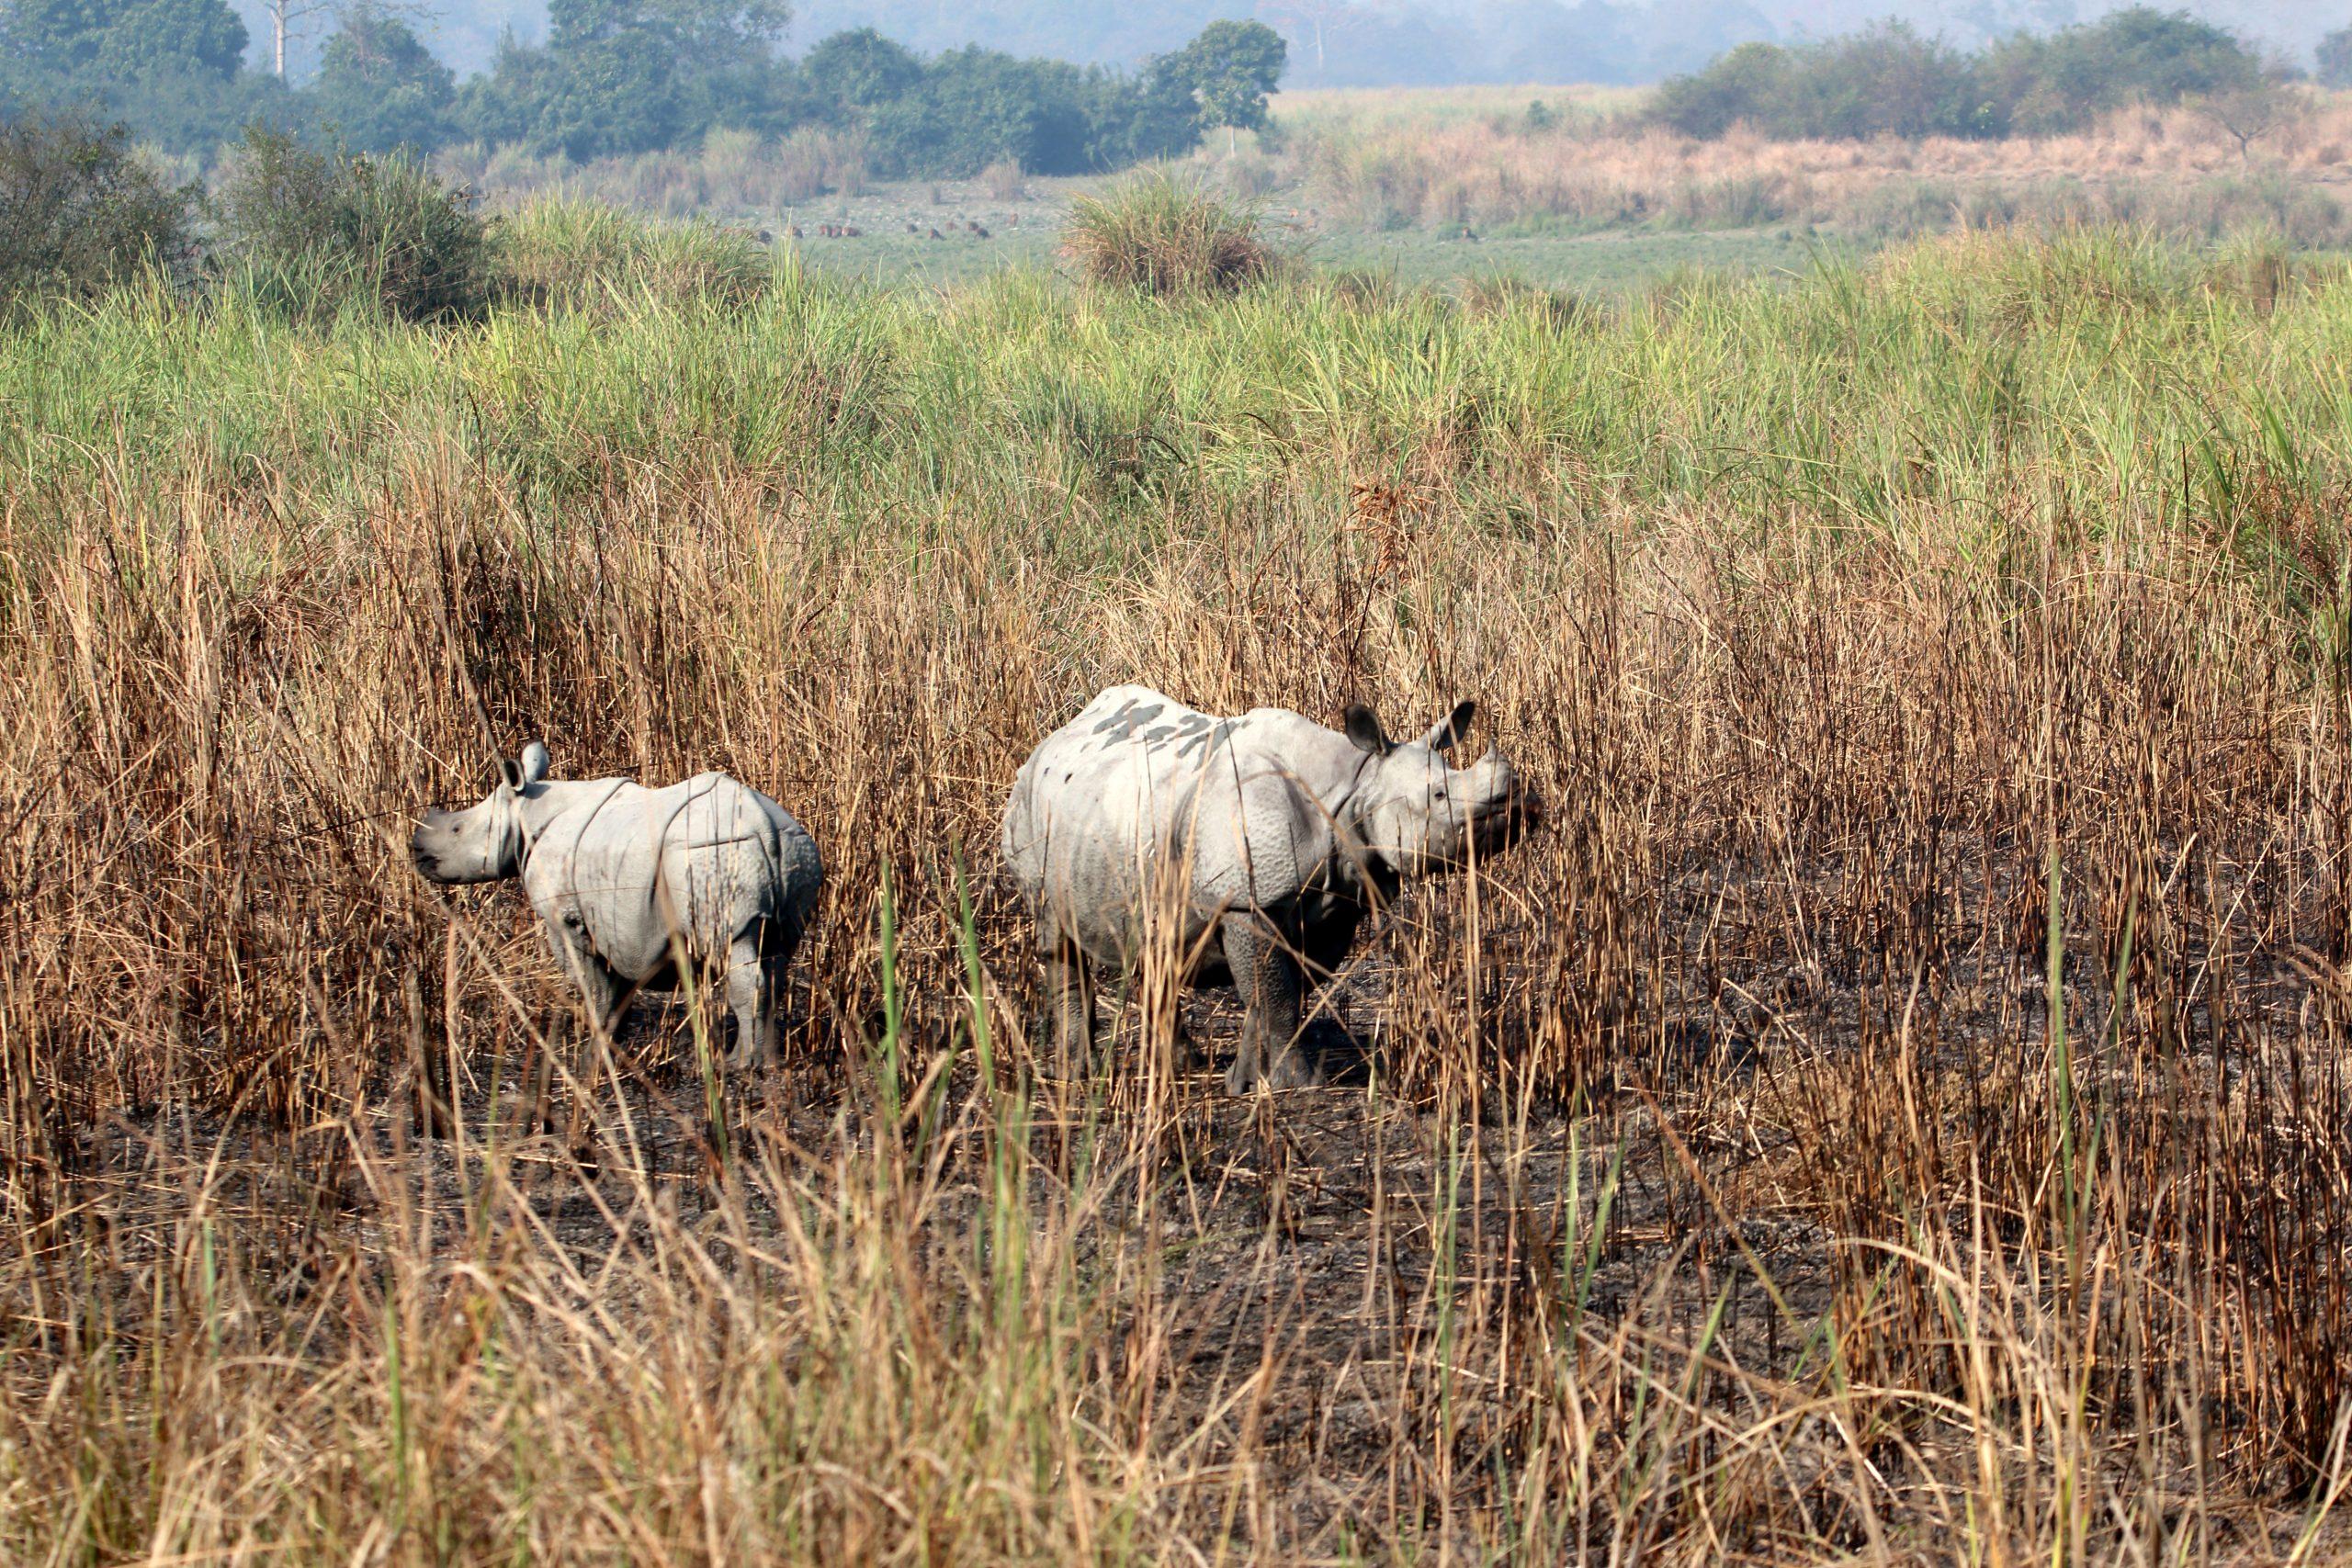 A pair of rhino in grassland